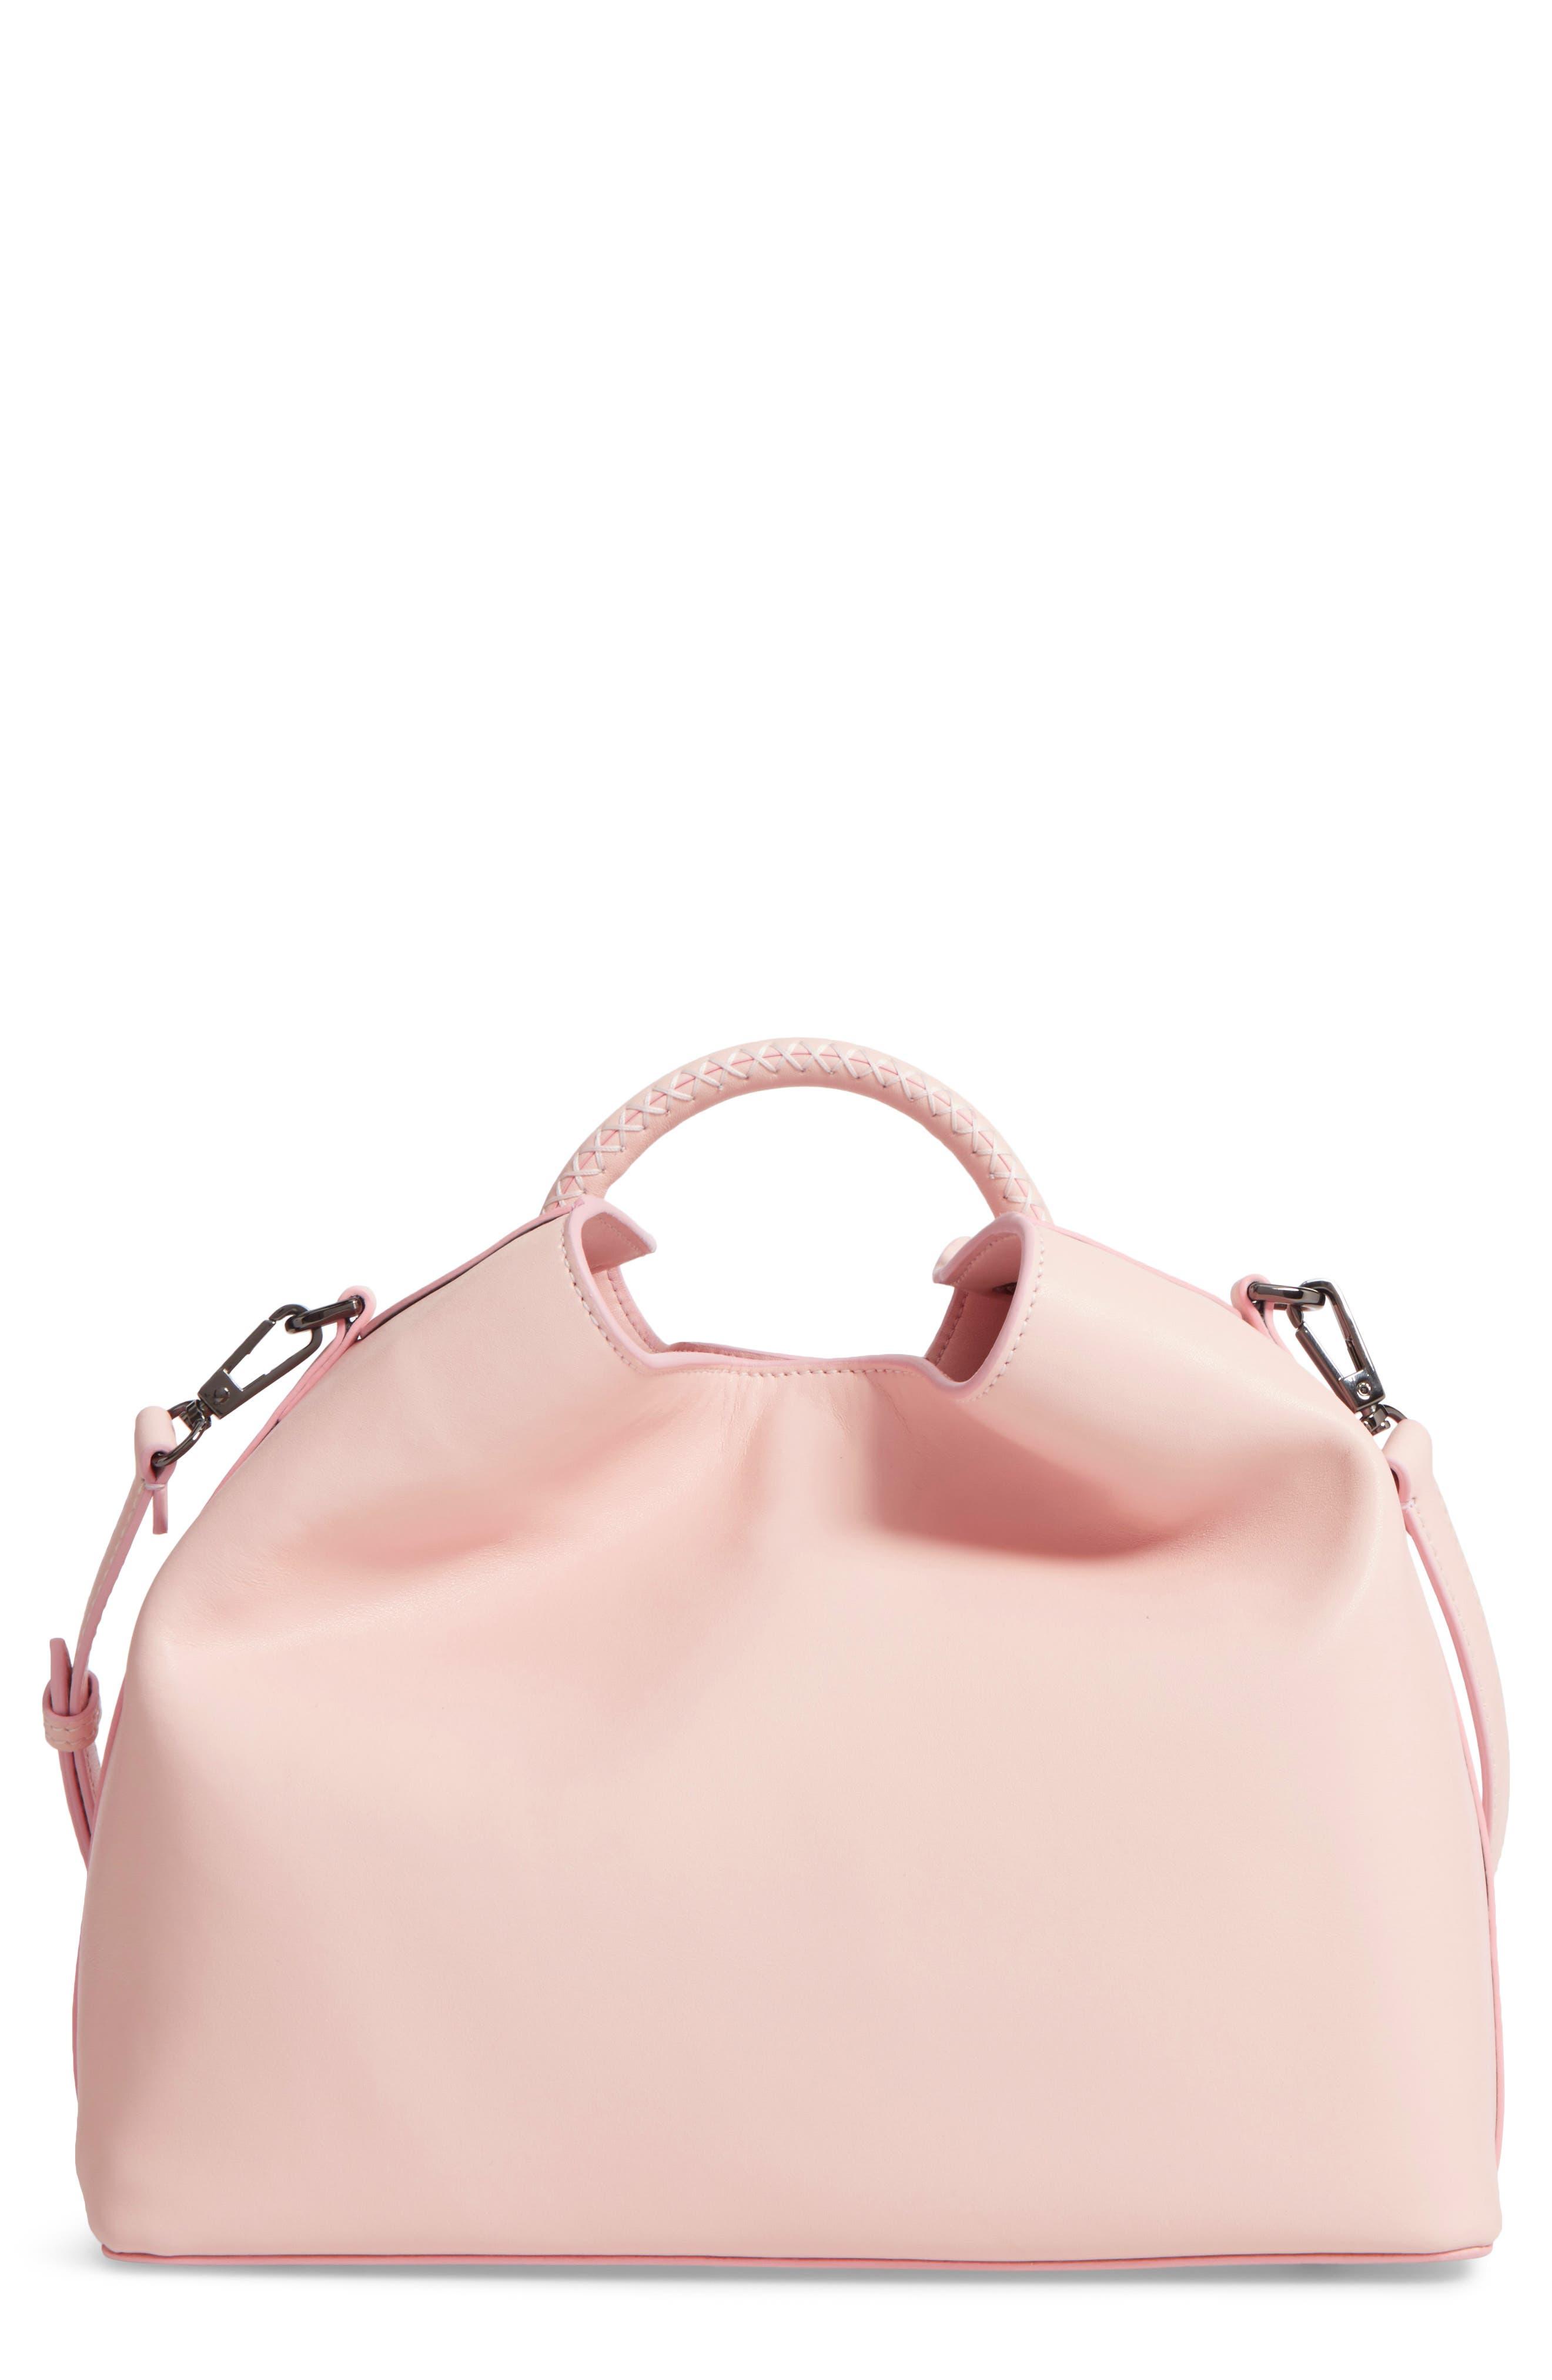 Raisin Leather Handbag,                             Main thumbnail 7, color,